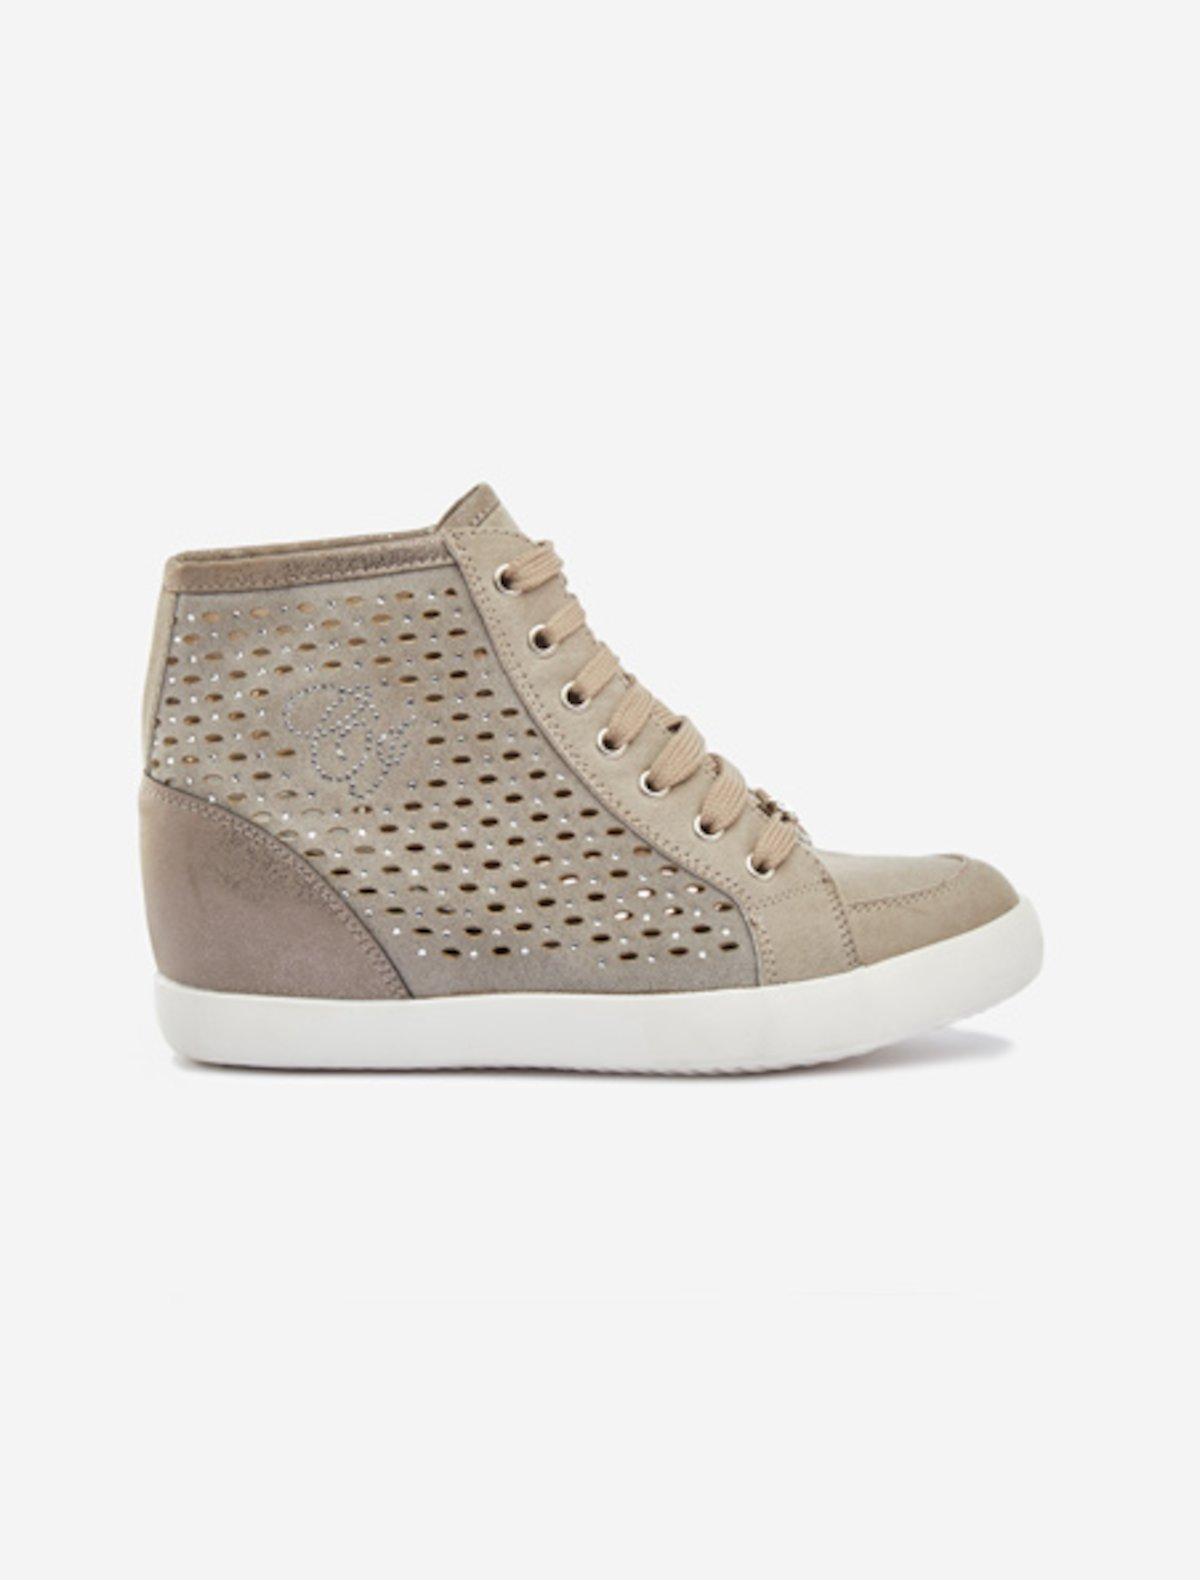 Faux-suede Sasha sneakers - Cinder